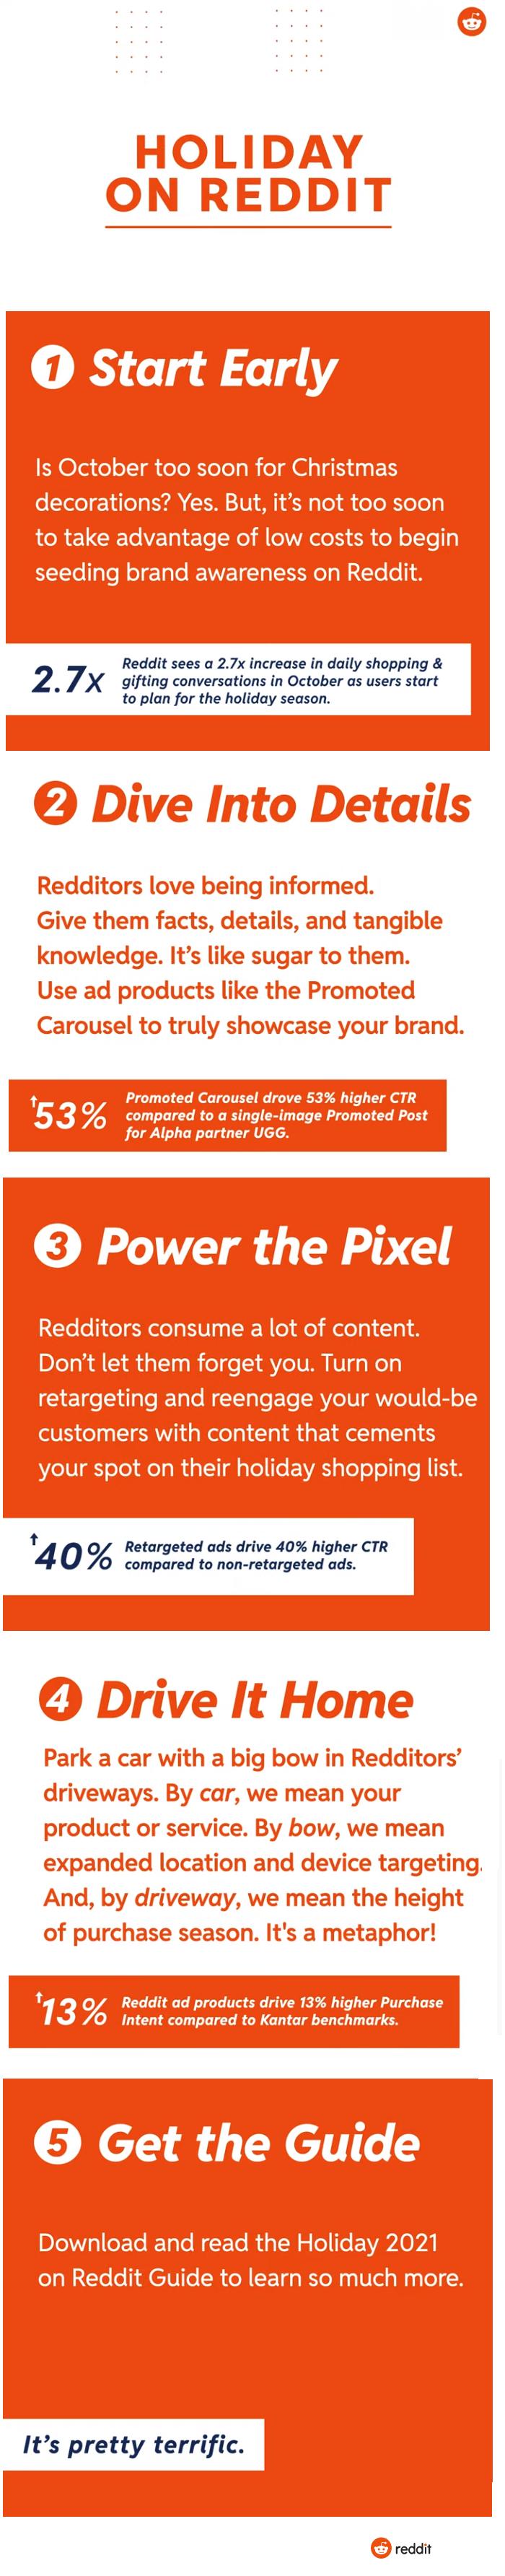 Reddit holiday marketing tips